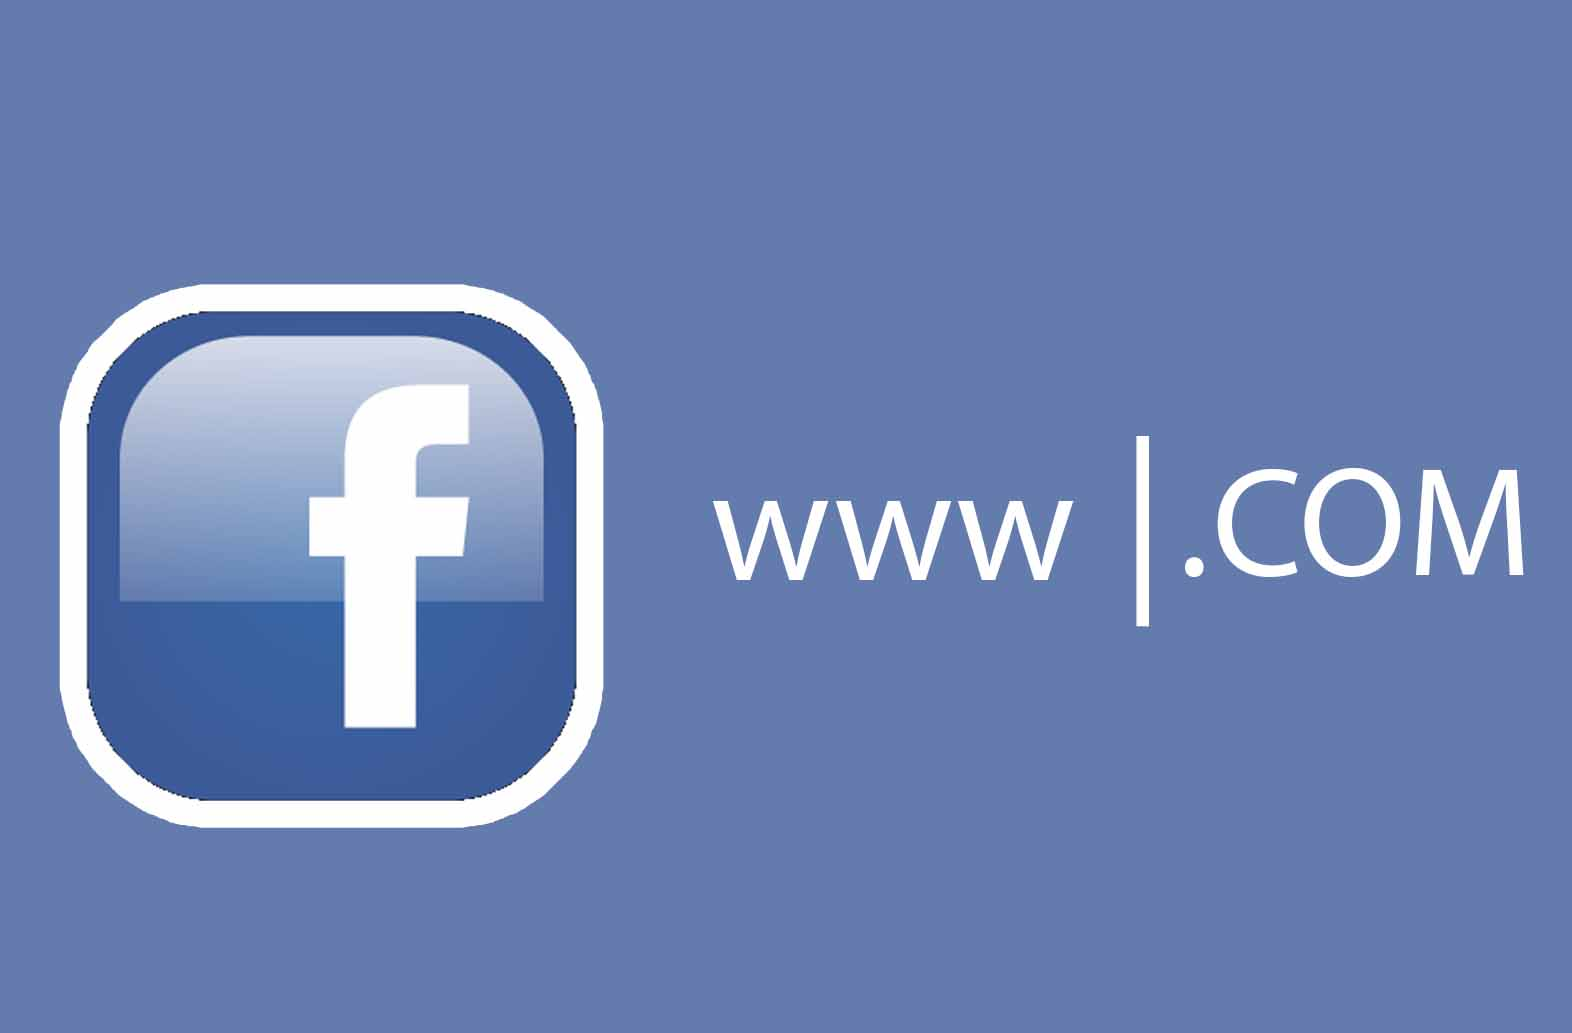 Facebook Address – Facebook Website Address